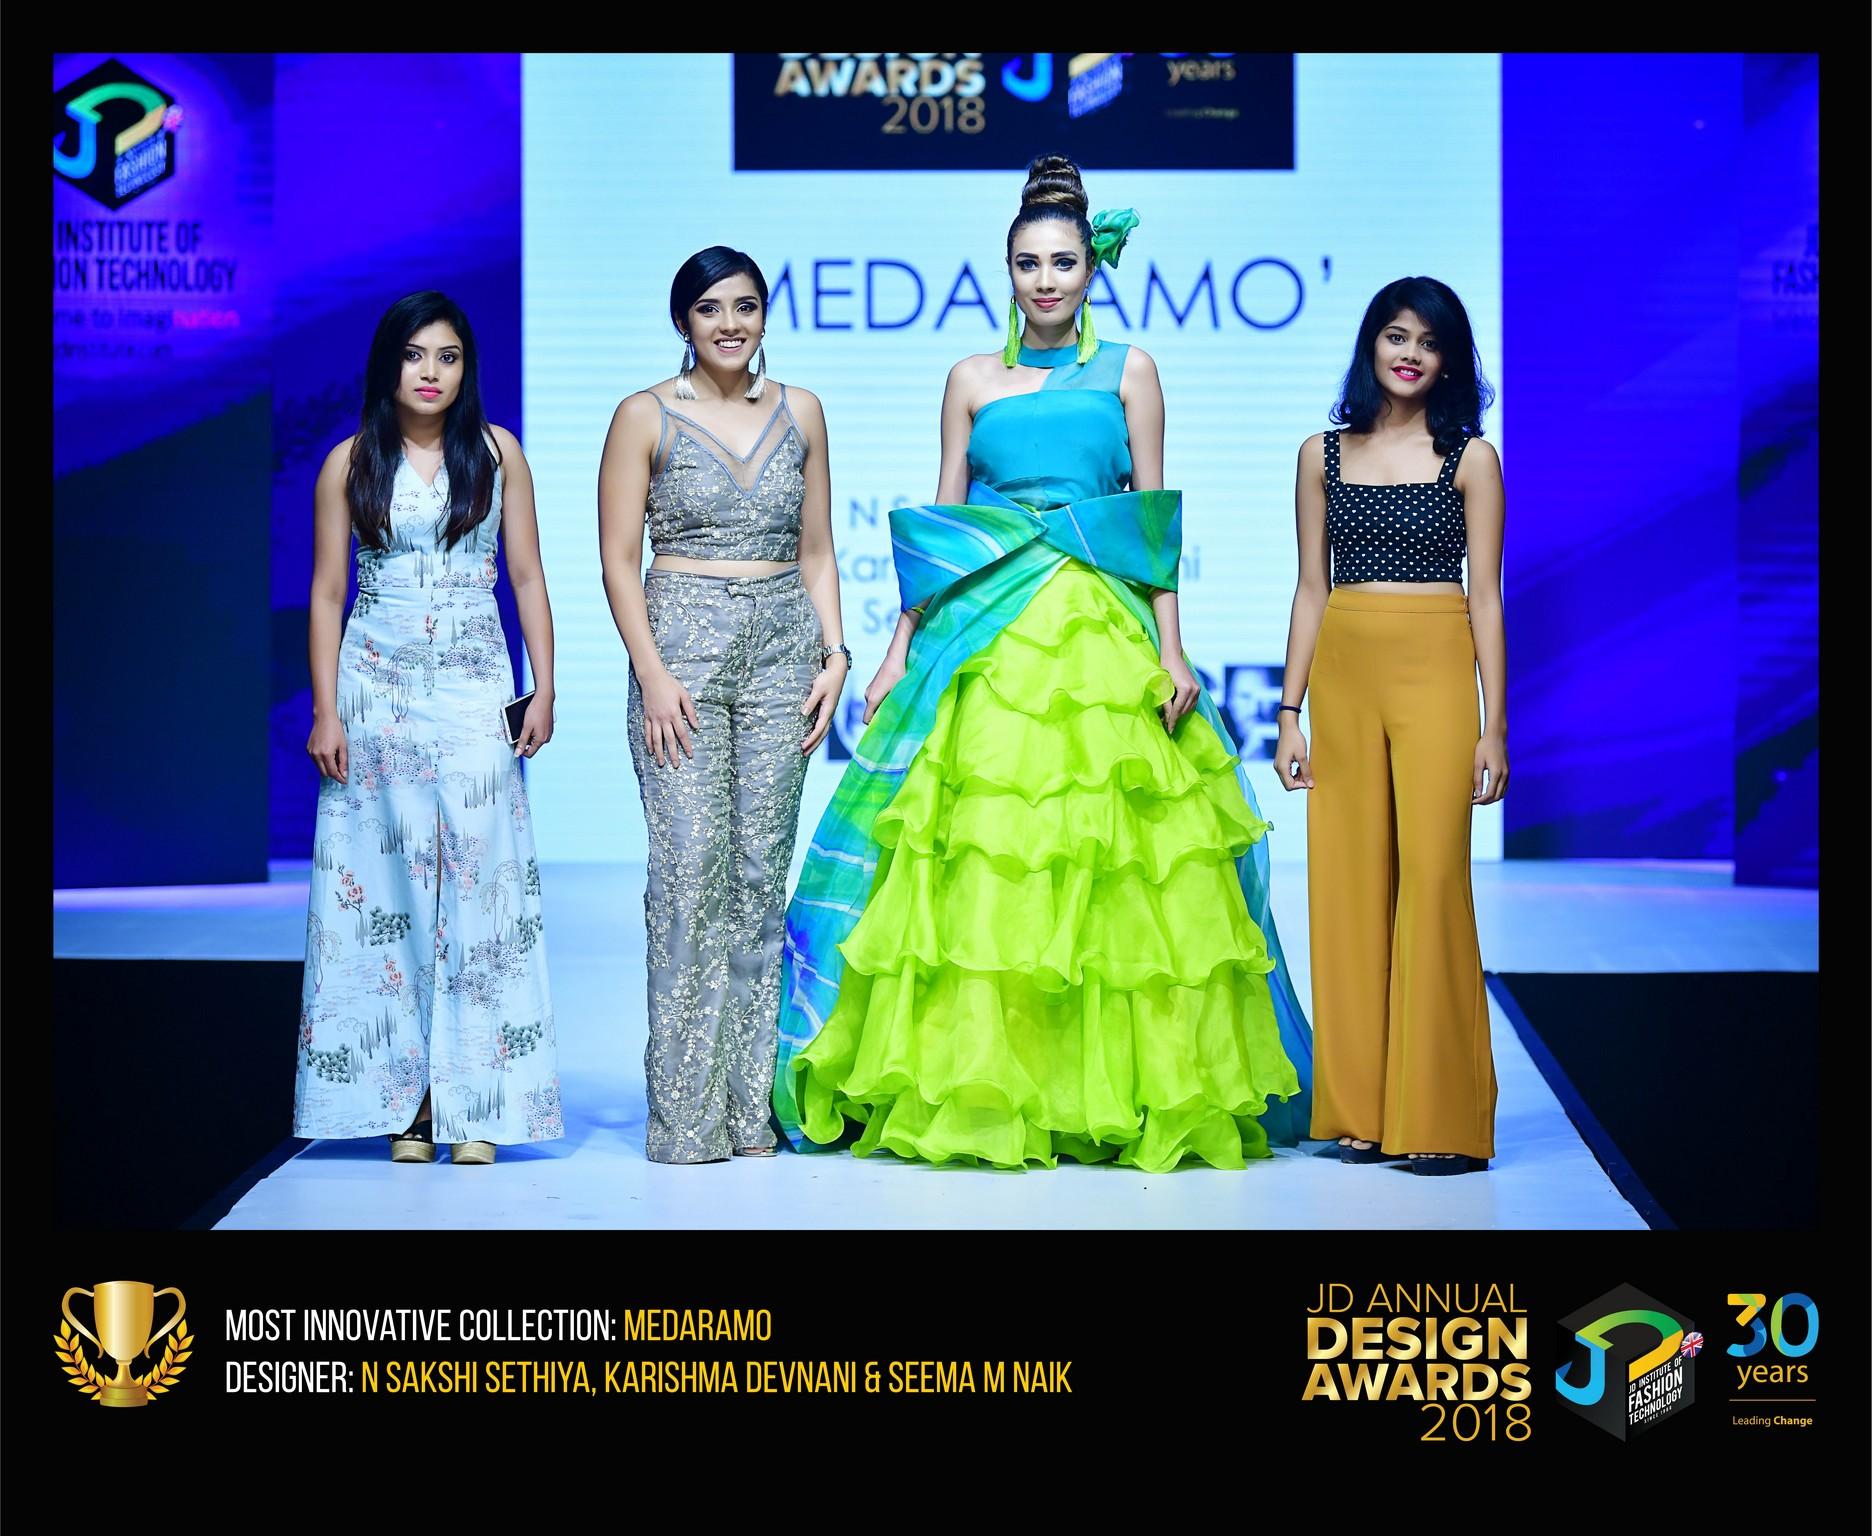 Medaramo – Change – JD Annual Design Awards 2018 | Designer: Sakshi, seema and Karishma DFD October 2017 | Photography : Jerin Nath (@jerin_nath) medaramo - Medaramo7 Final - Medaramo – Change – JD Annual Design Awards 2018